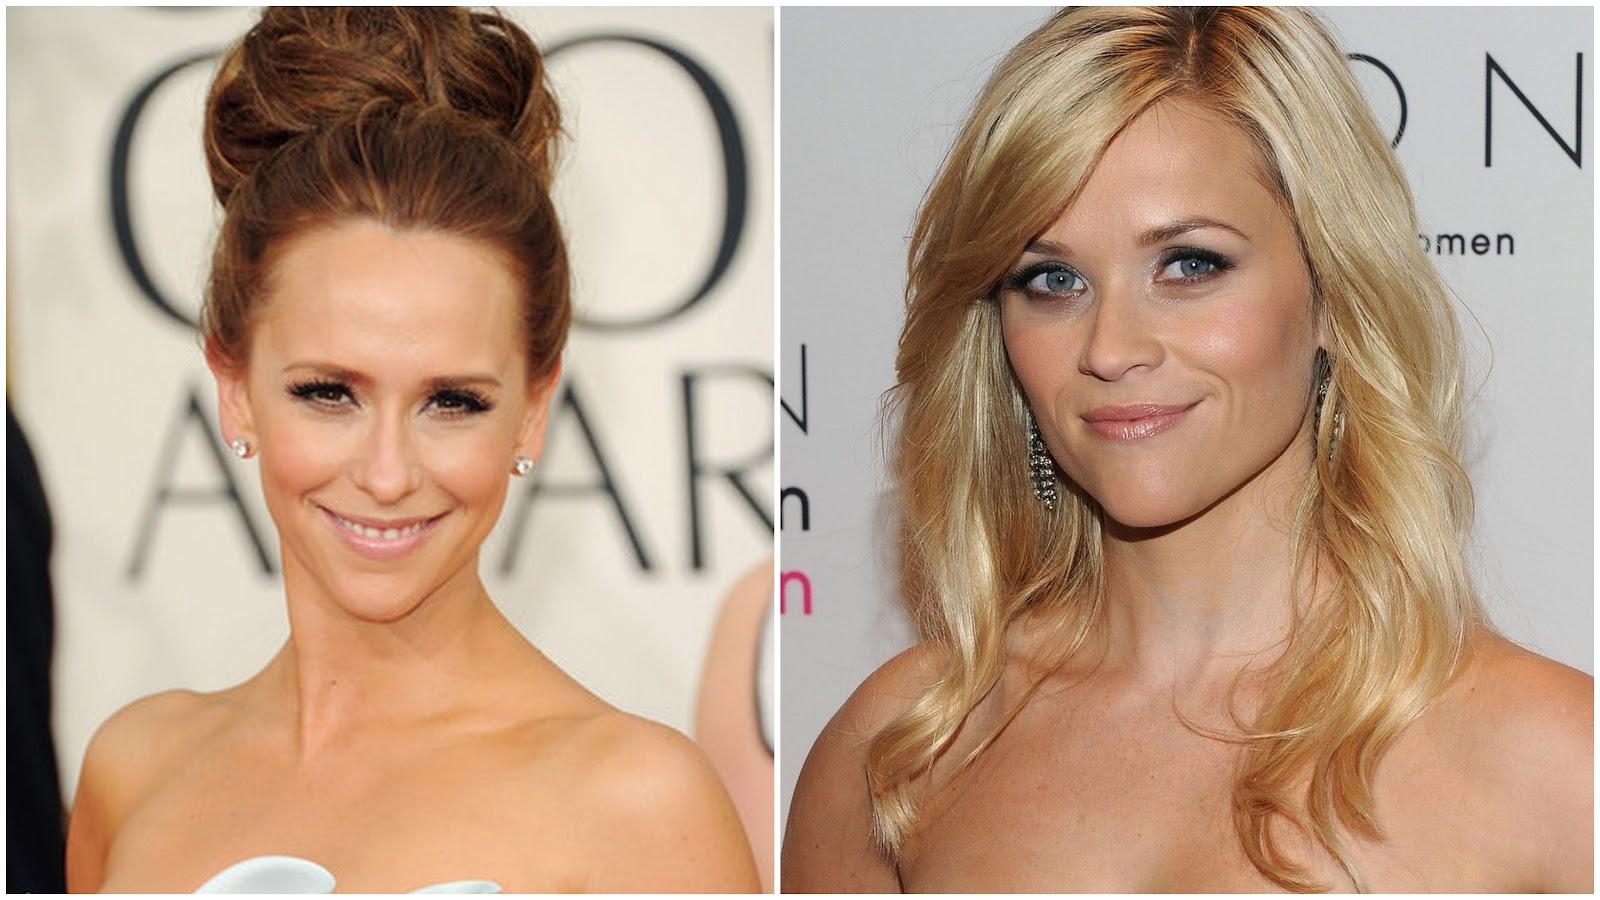 http://3.bp.blogspot.com/-syVumOVSJgk/T7mfrZLGYFI/AAAAAAAABCY/kqb9tGr7Psg/s1600/Jennifer+Love+Hewitt++Reese+Witherspoon+heart+shaped+face.jpg